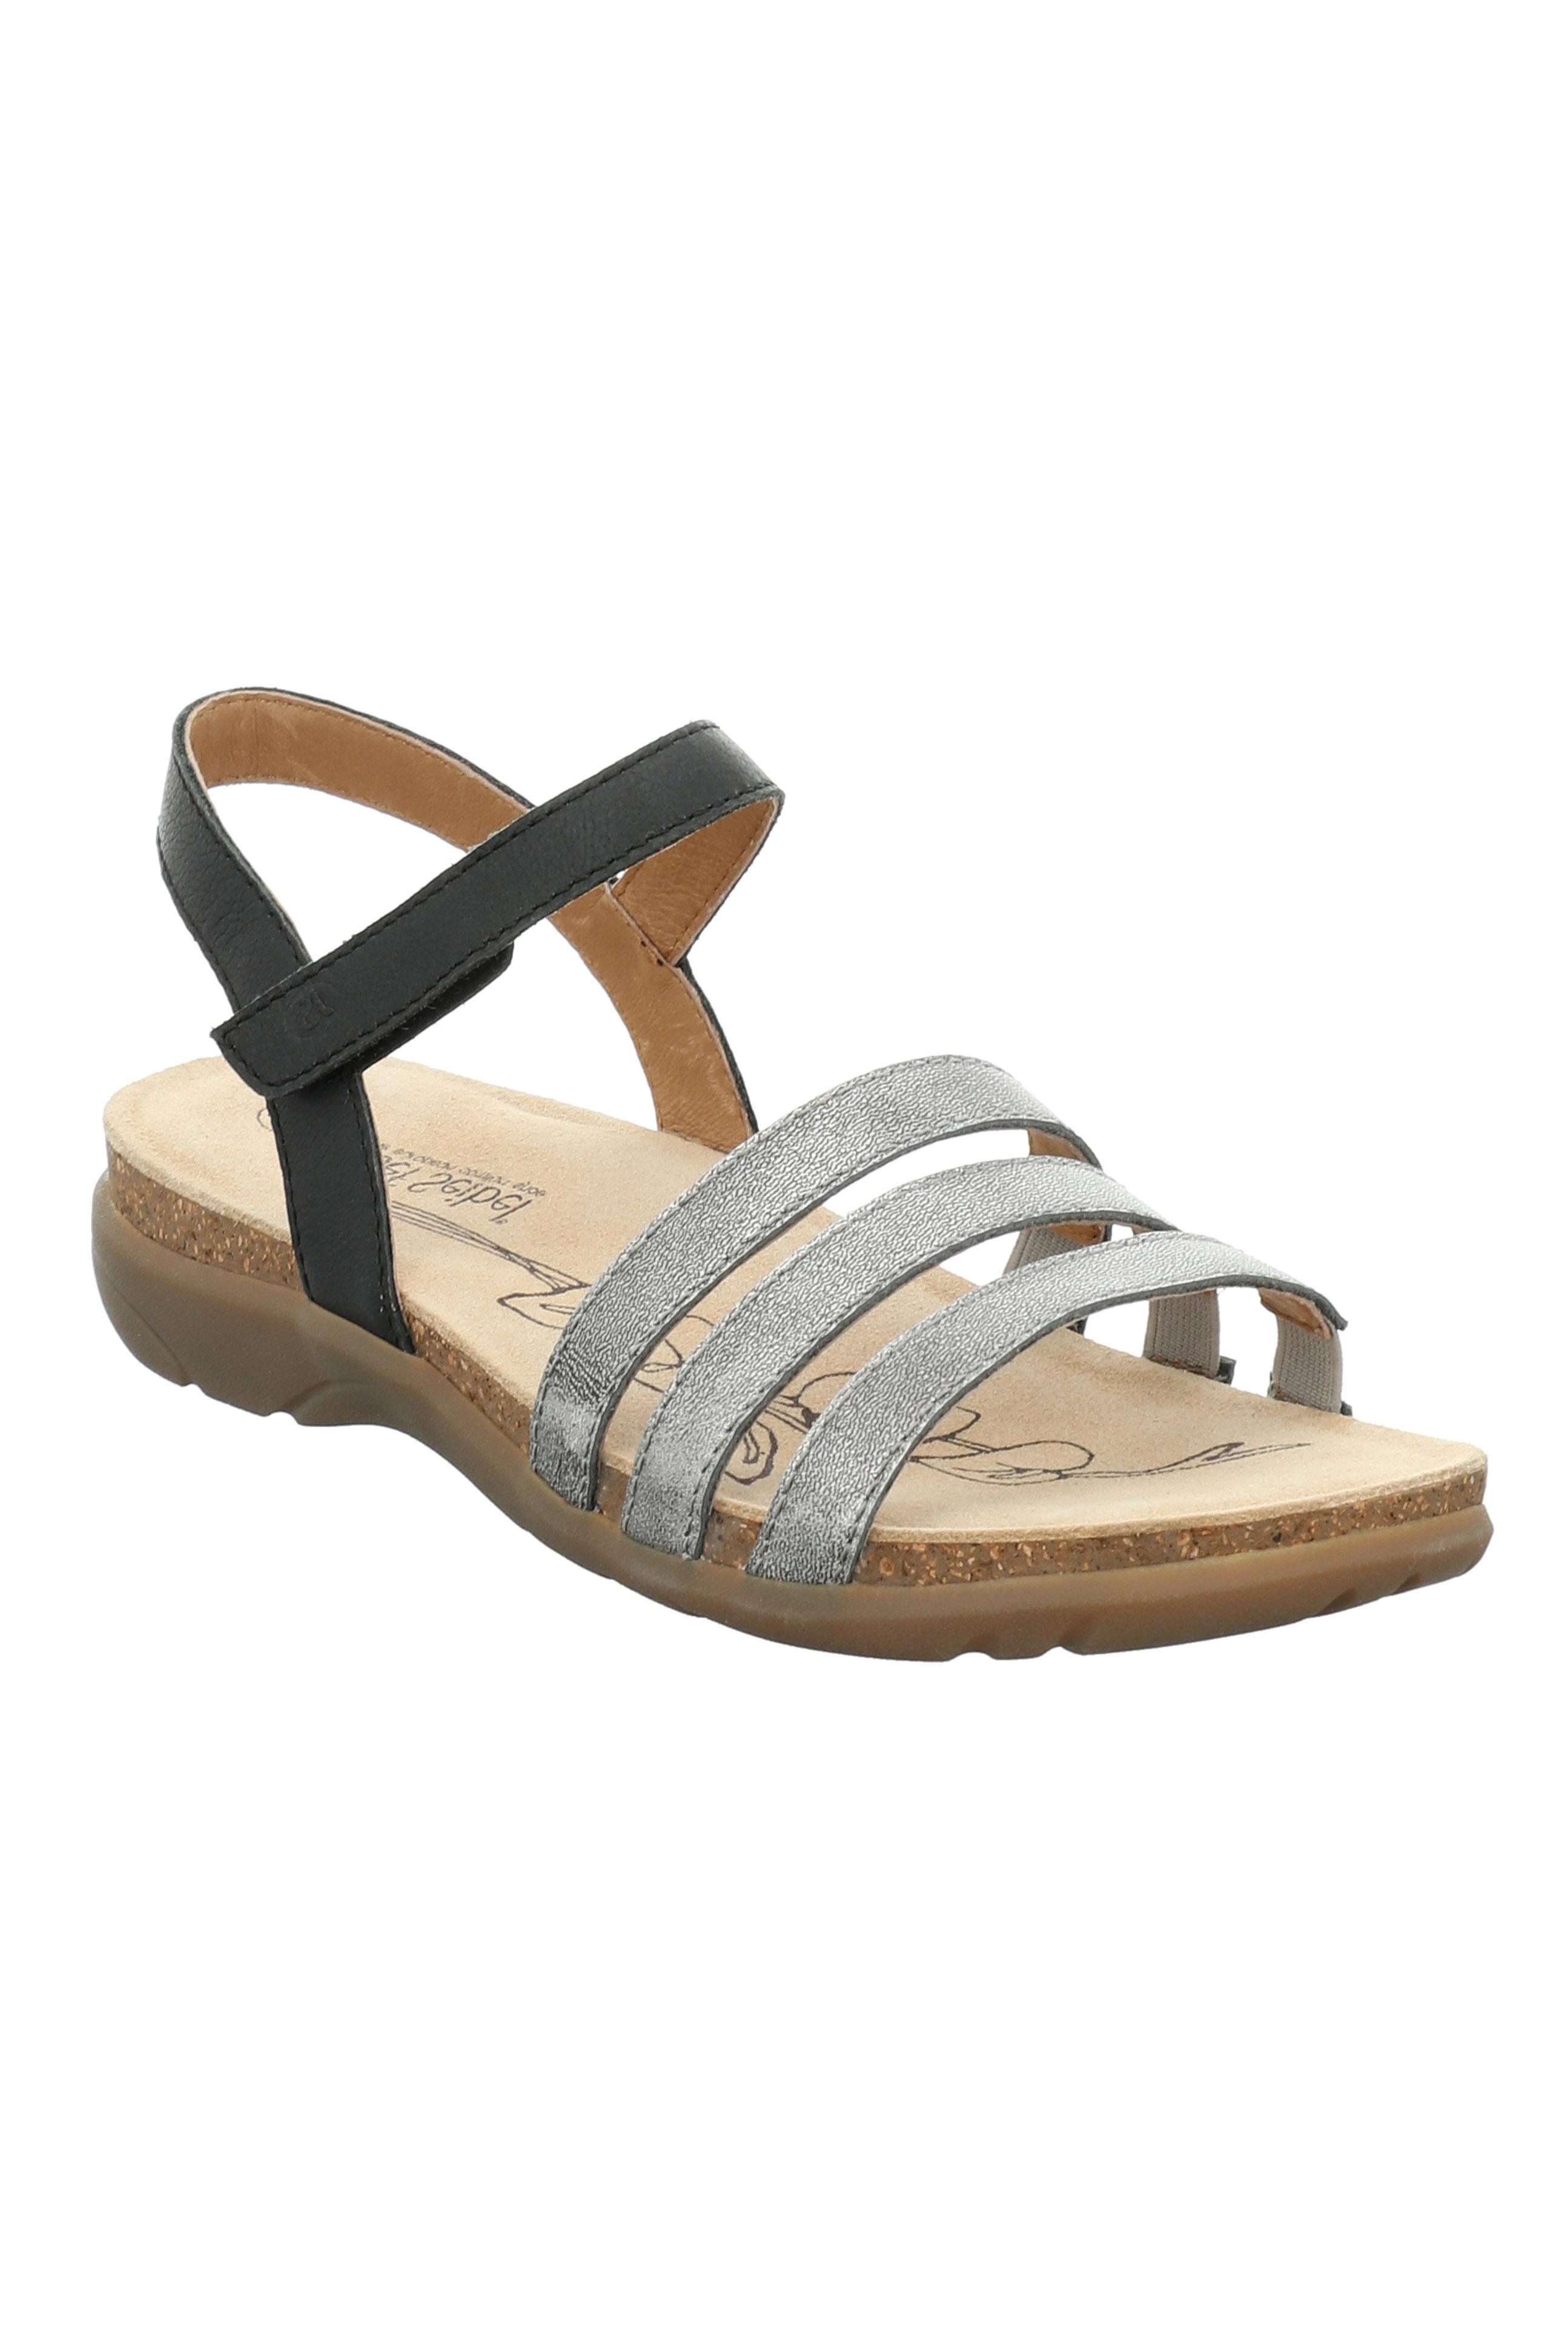 Josef Seibel Riley 01 Leather Sandal